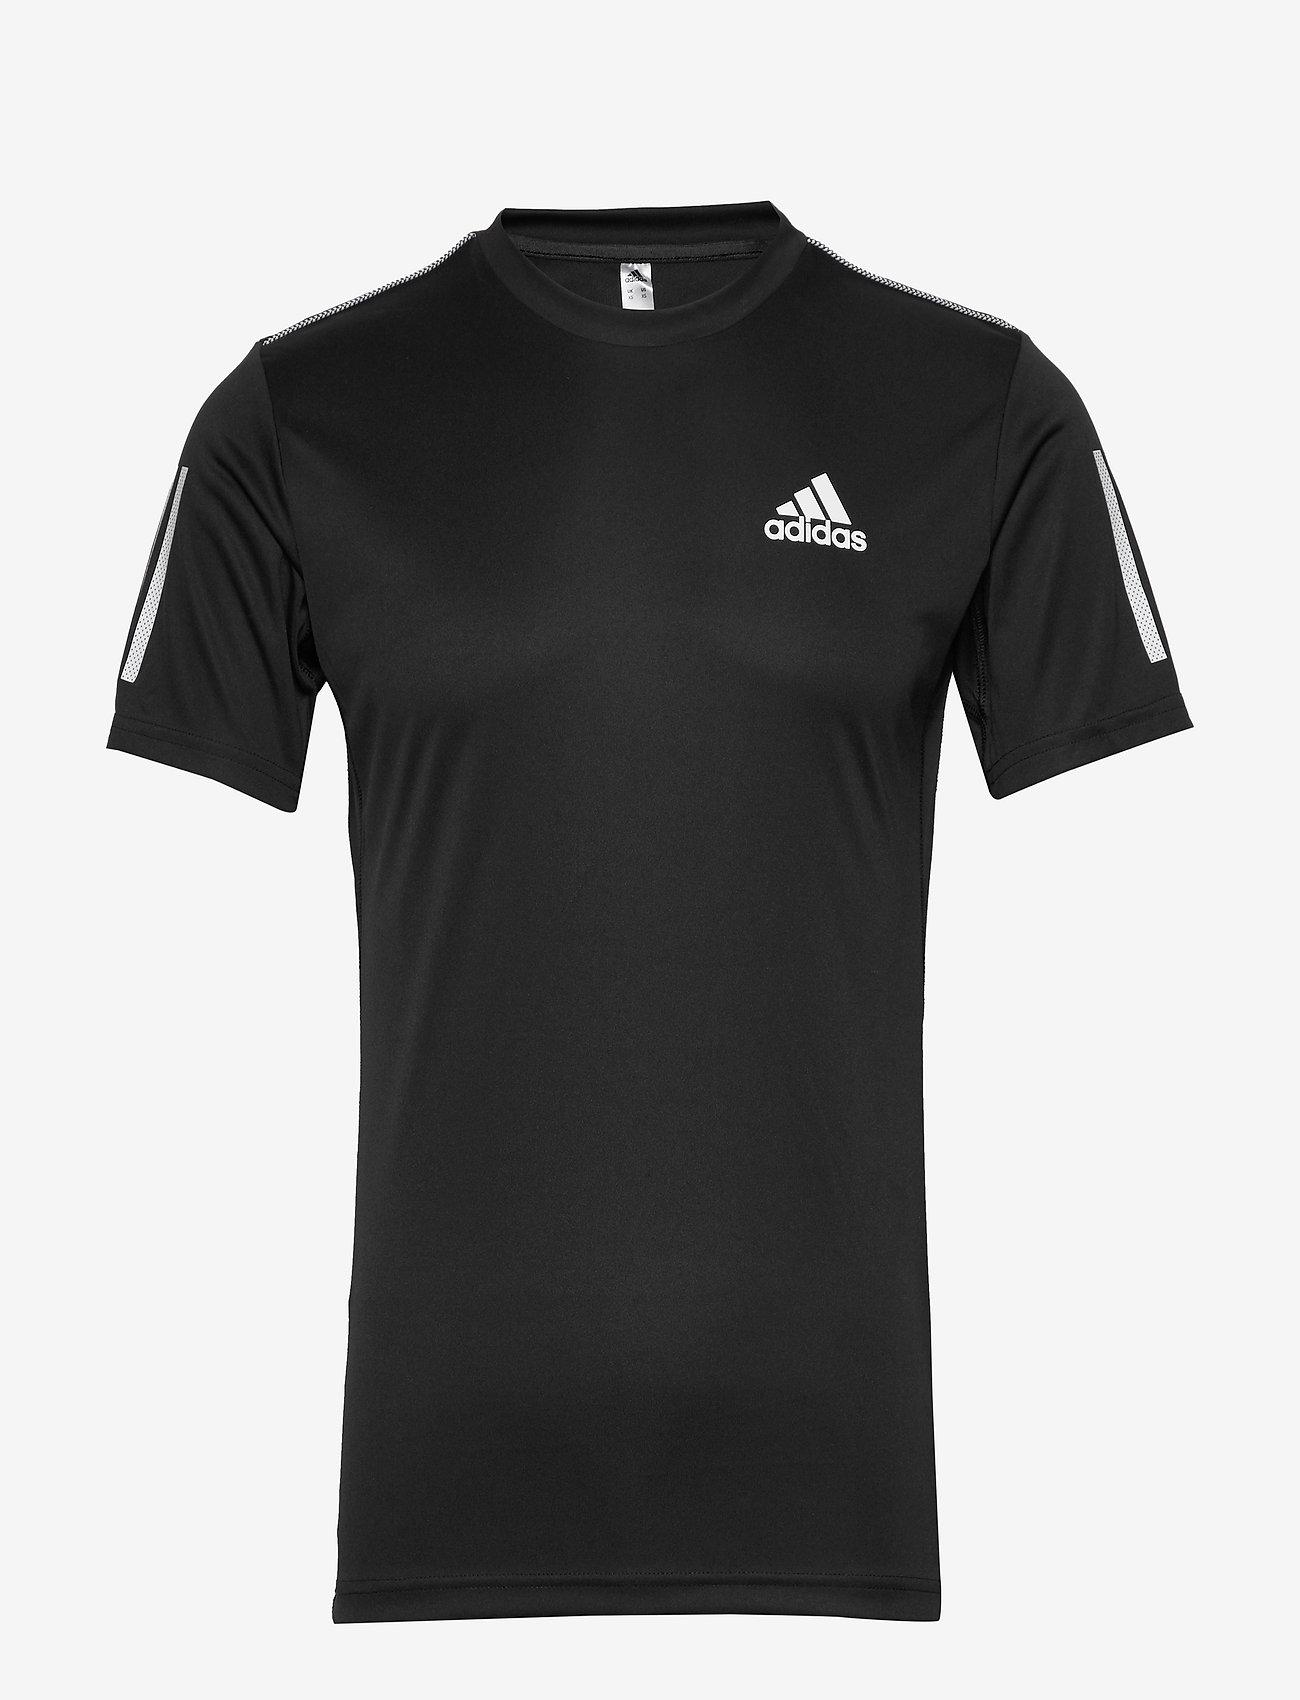 adidas Performance - 3-Stripes Club Tee - sportoberteile - black - 1